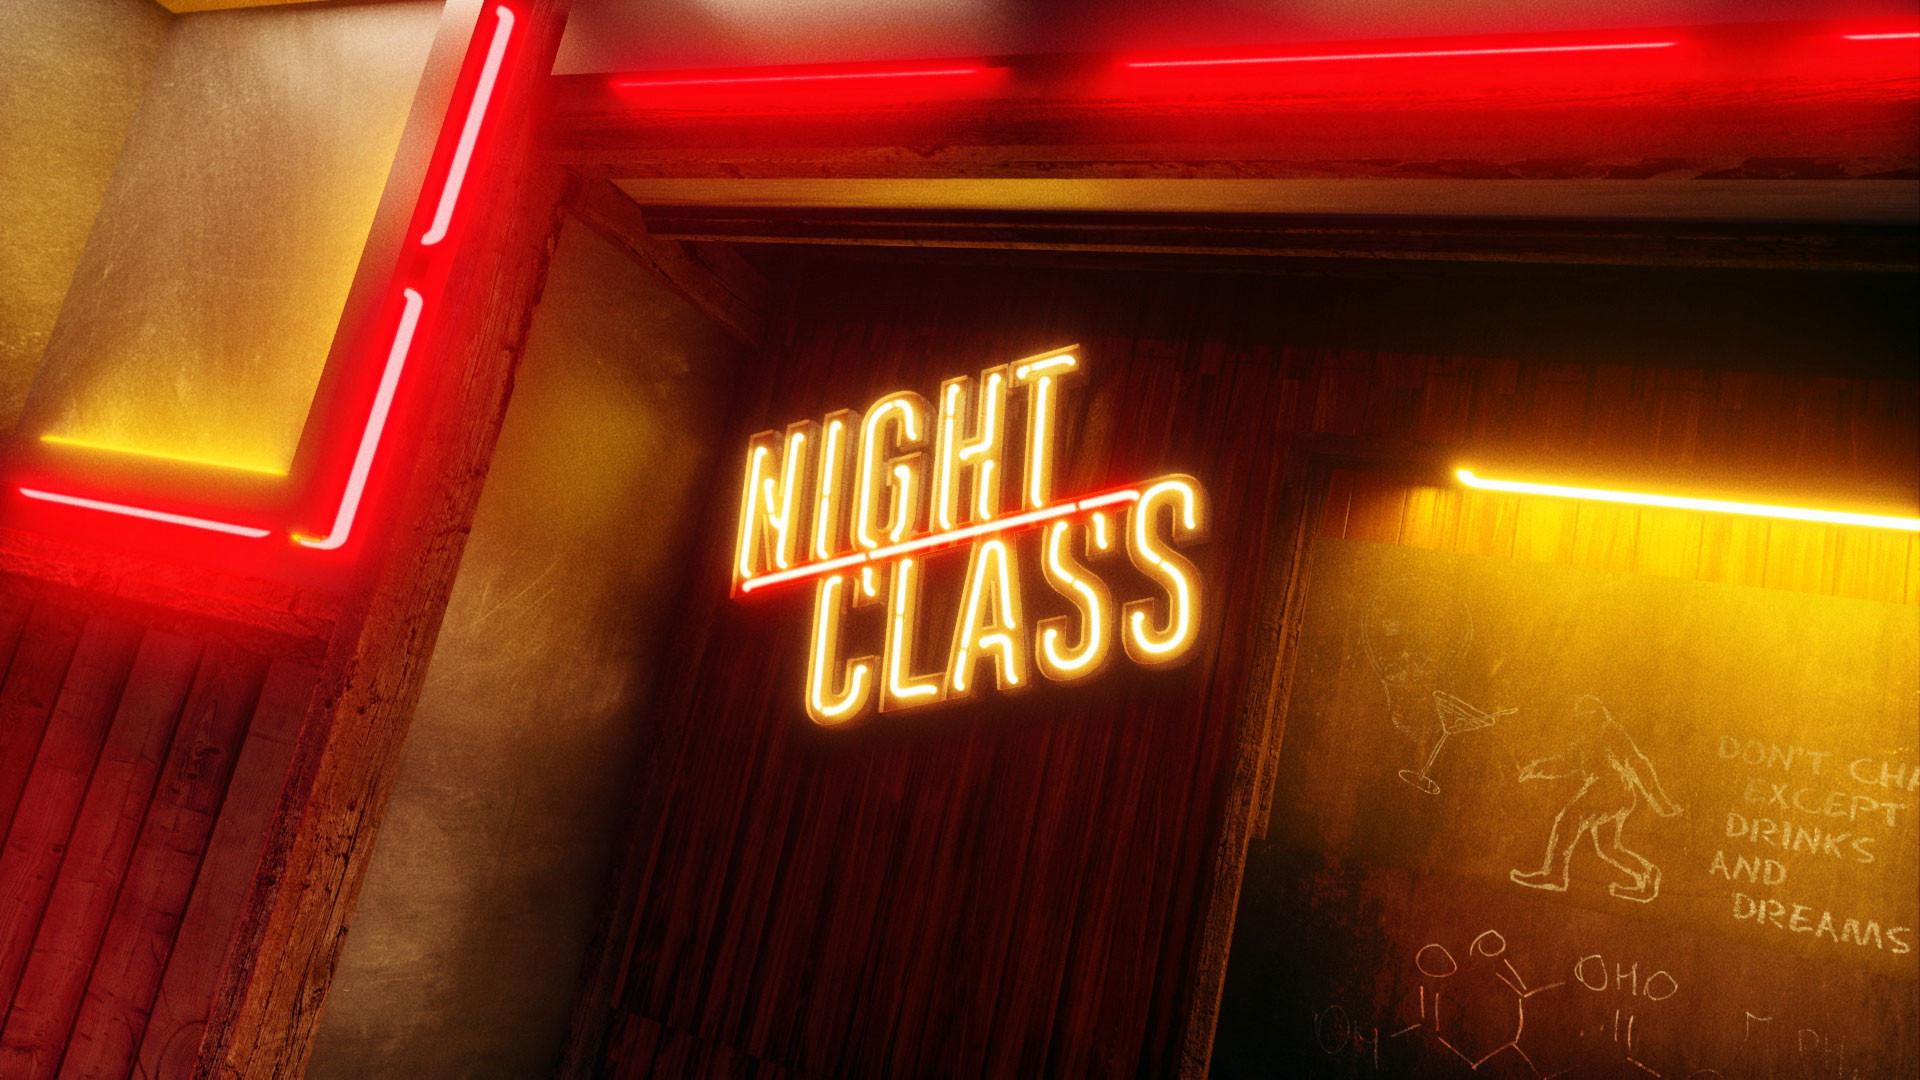 nightClass0249.jpg